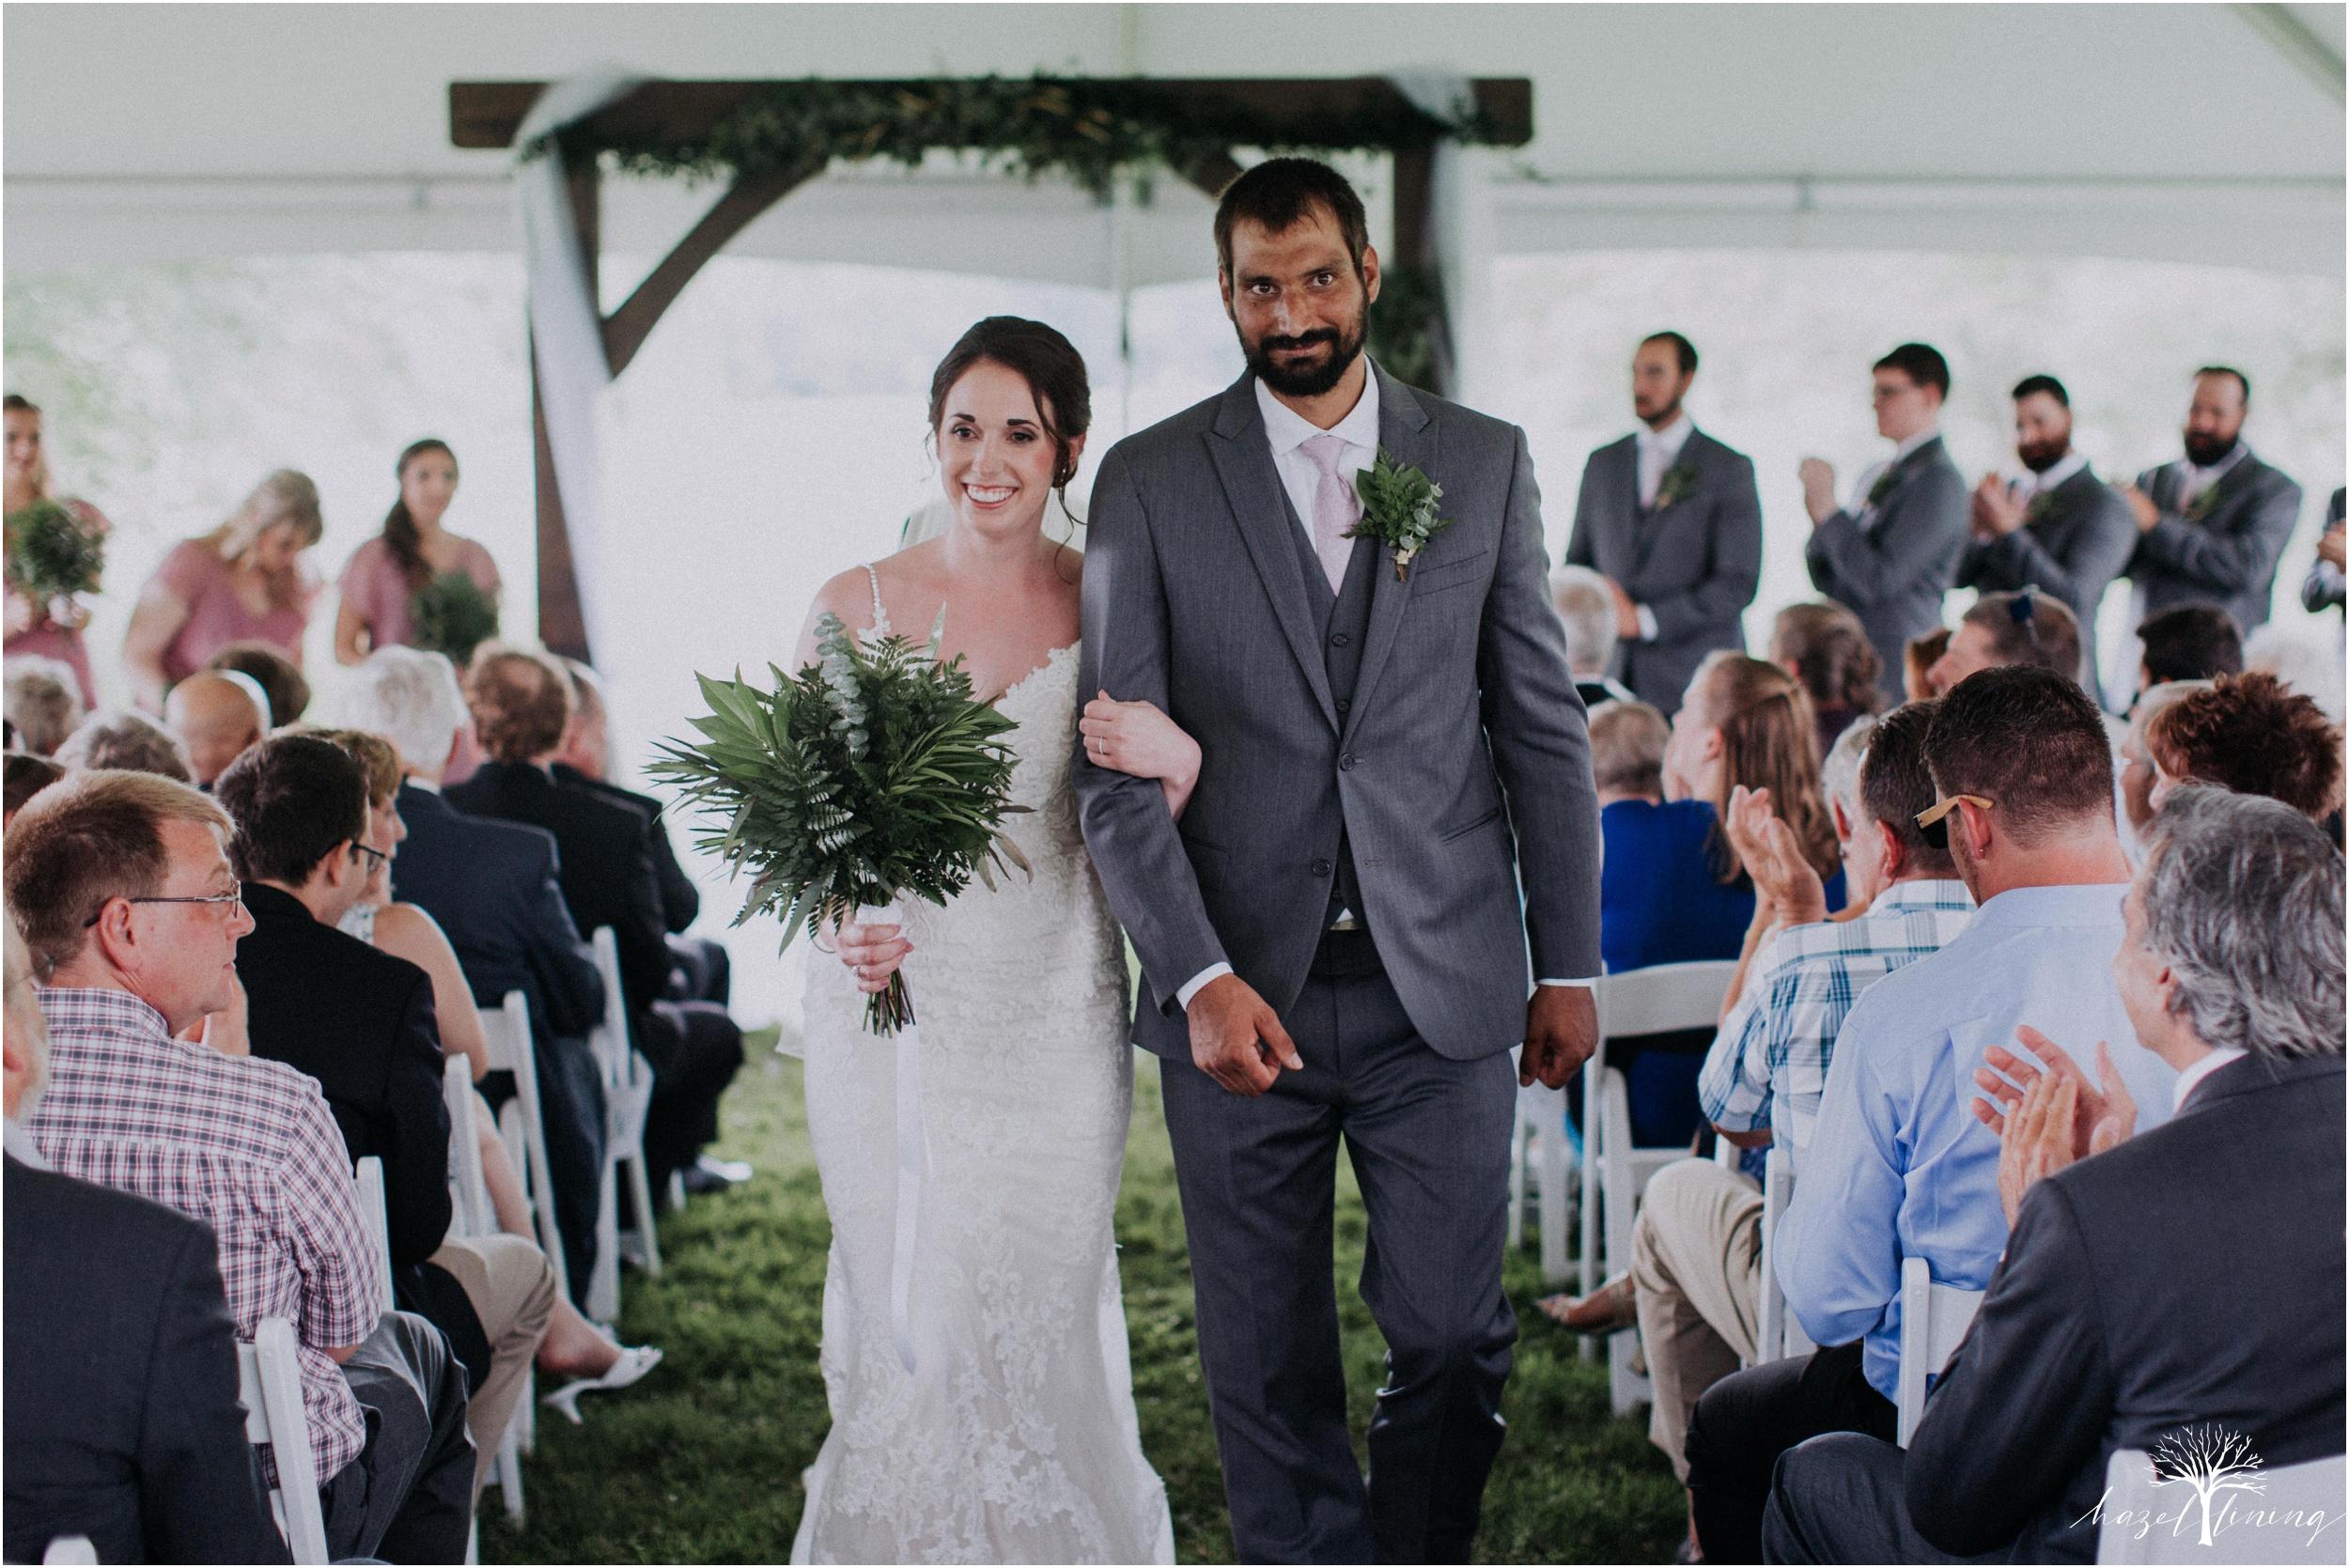 hazel-lining-travel-wedding-elopement-photography-lisa-landon-shoemaker-the-farm-bakery-and-events-bucks-county-quakertown-pennsylvania-summer-country-outdoor-farm-wedding_0067.jpg